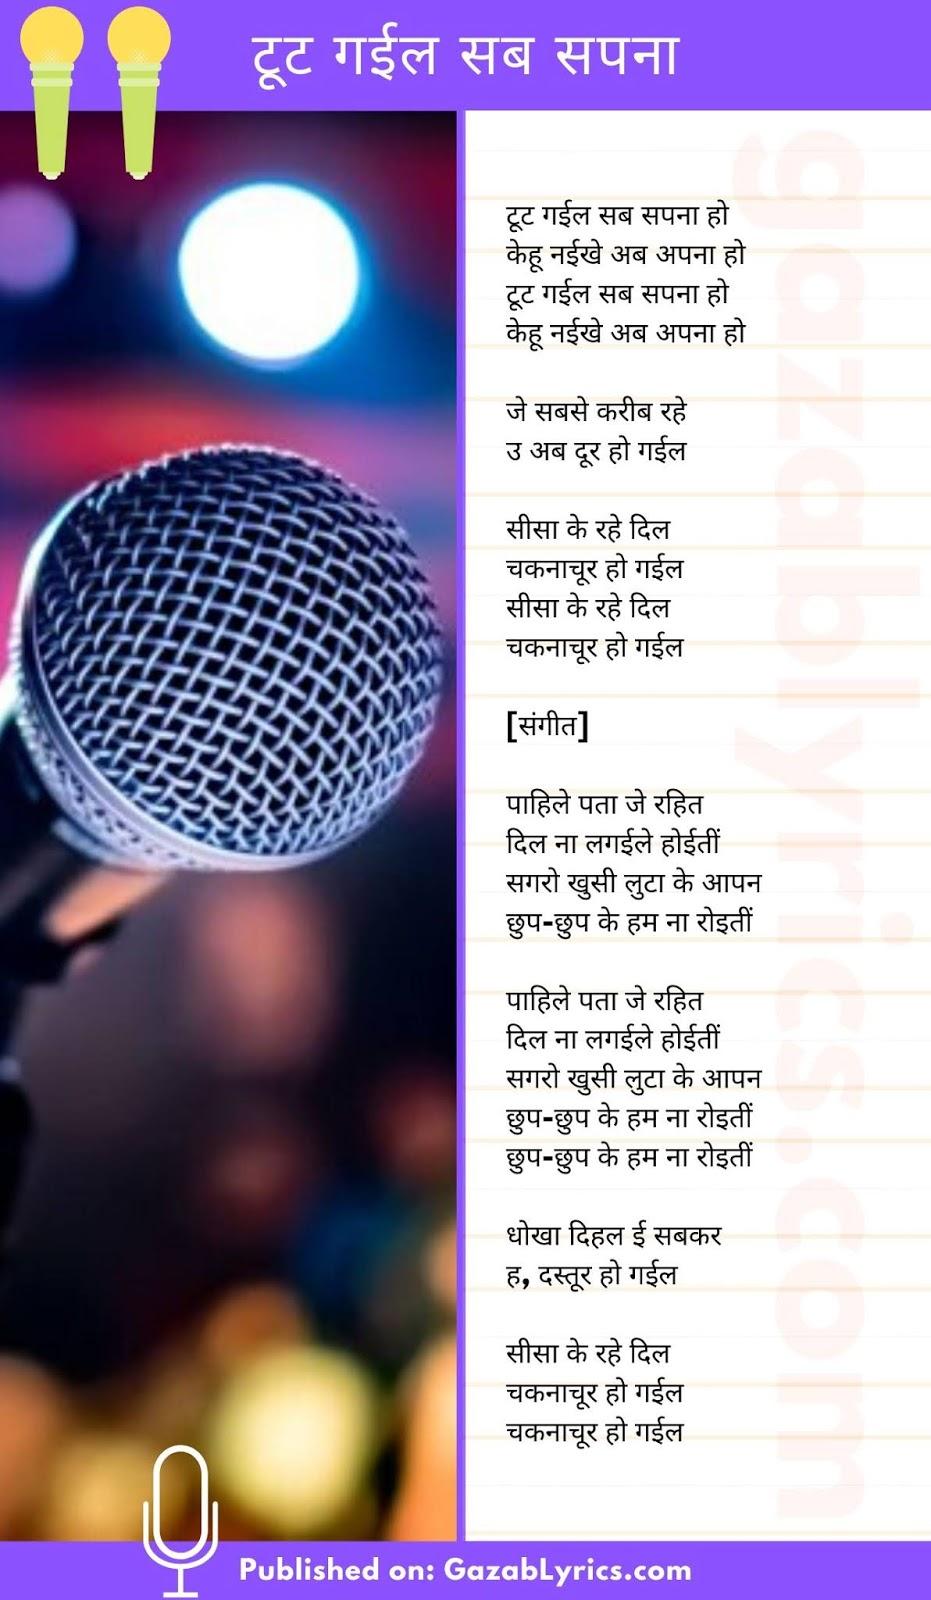 Toot Gayil Sab Sapna song lyrics image